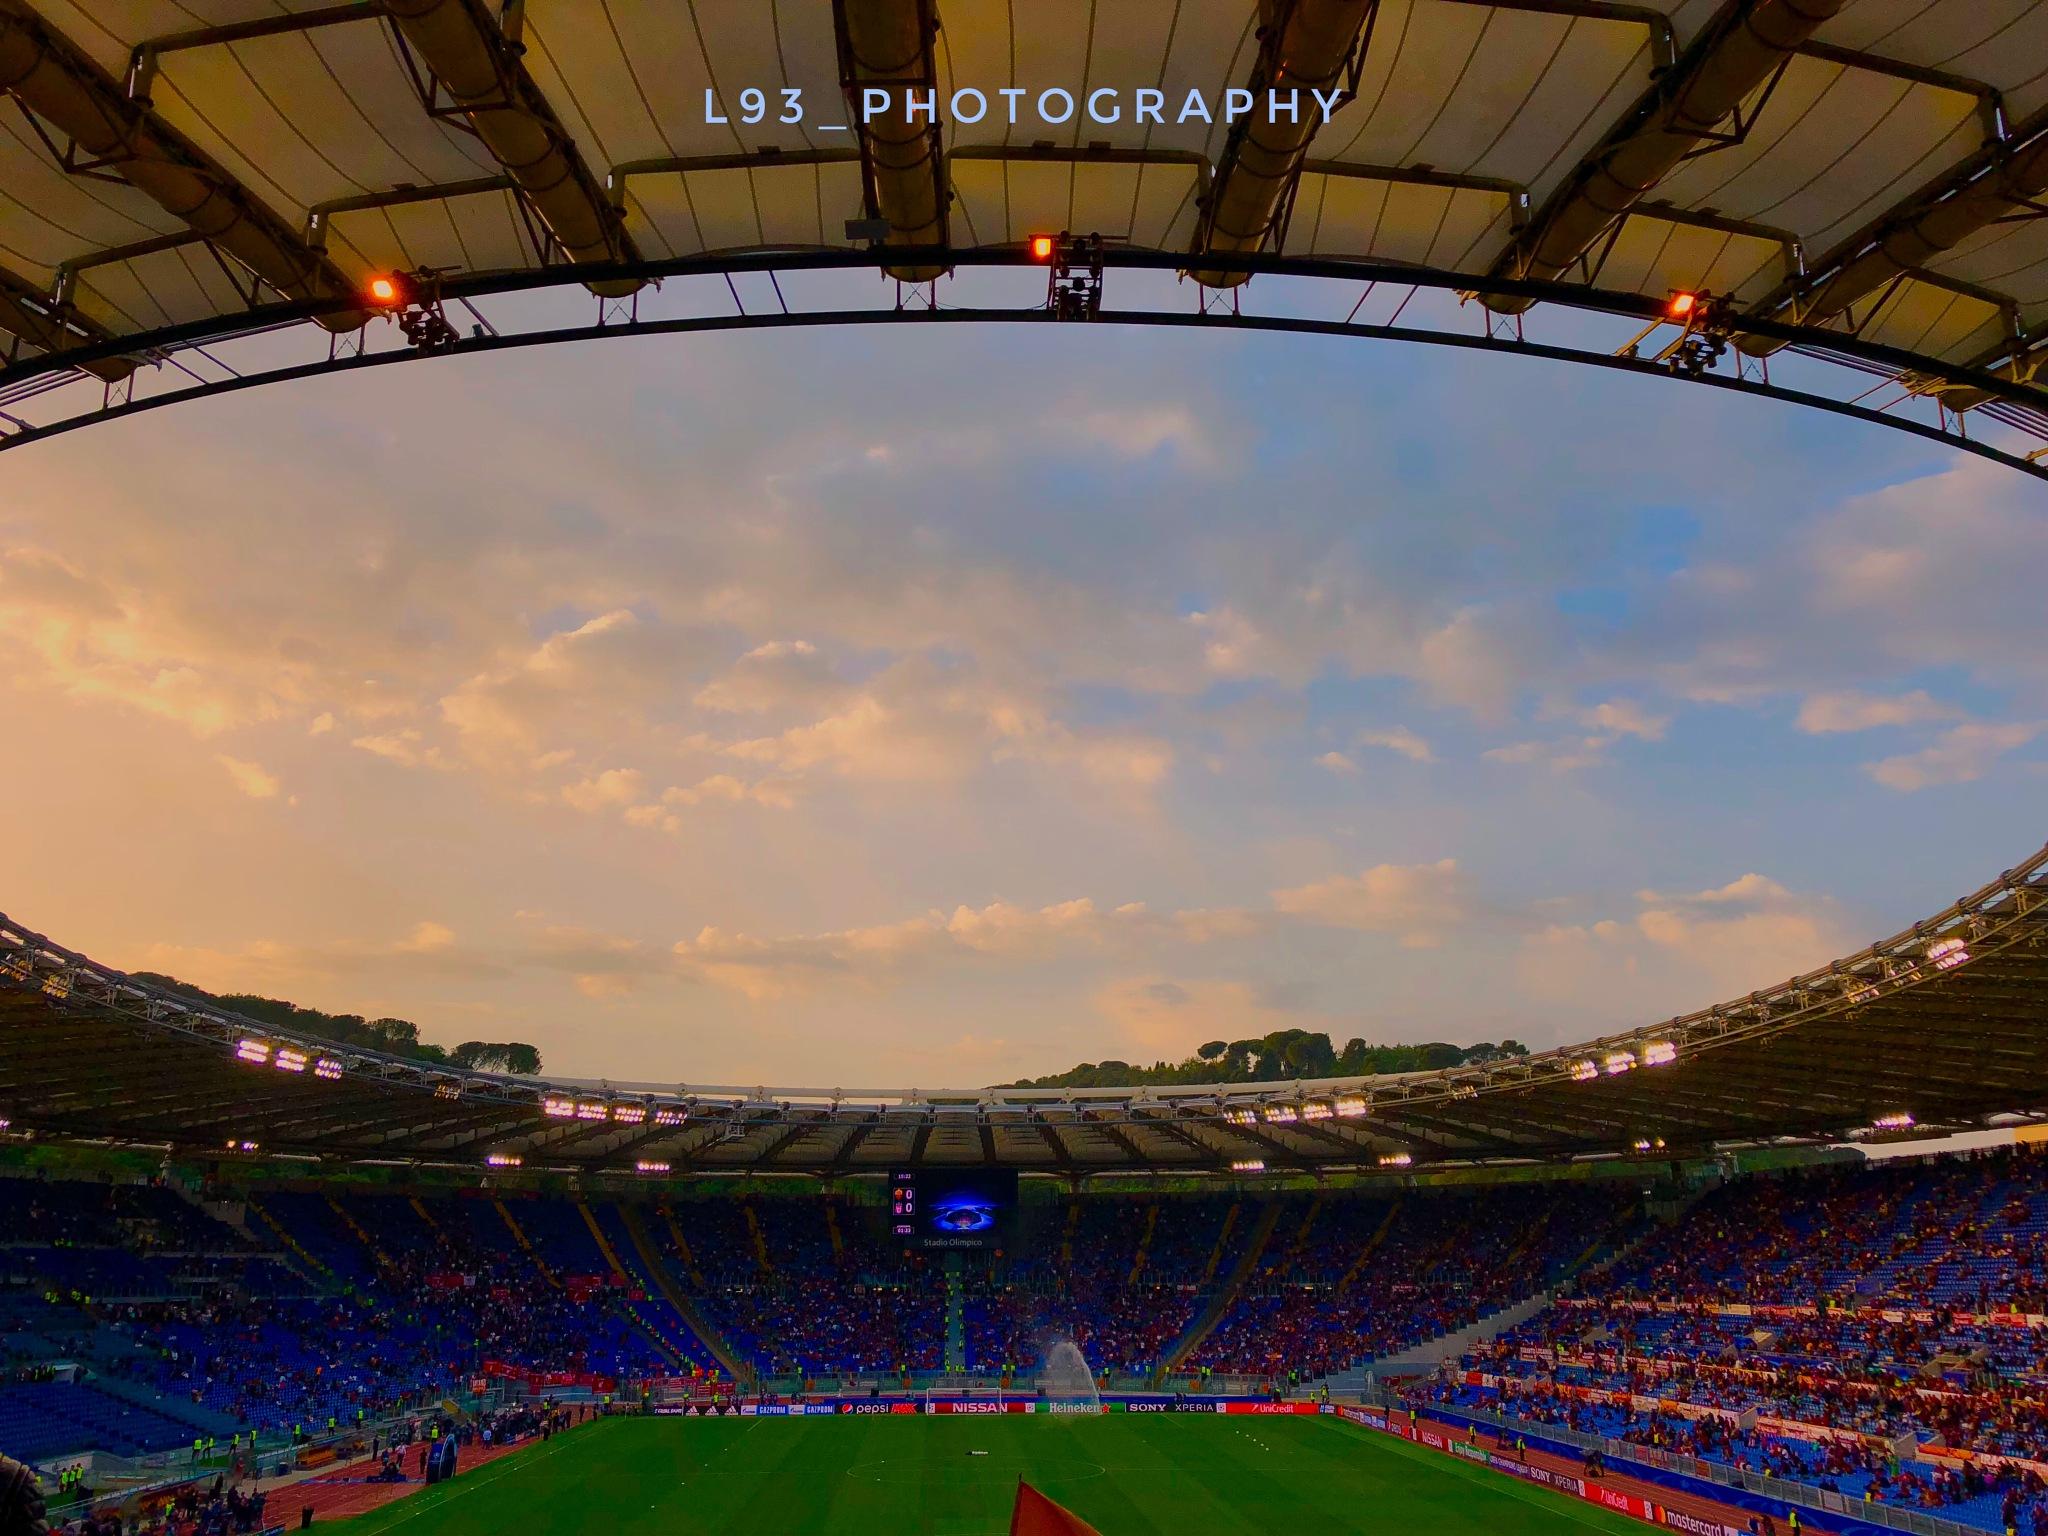 Stadio Olimpico Curva Sud by l93_photography